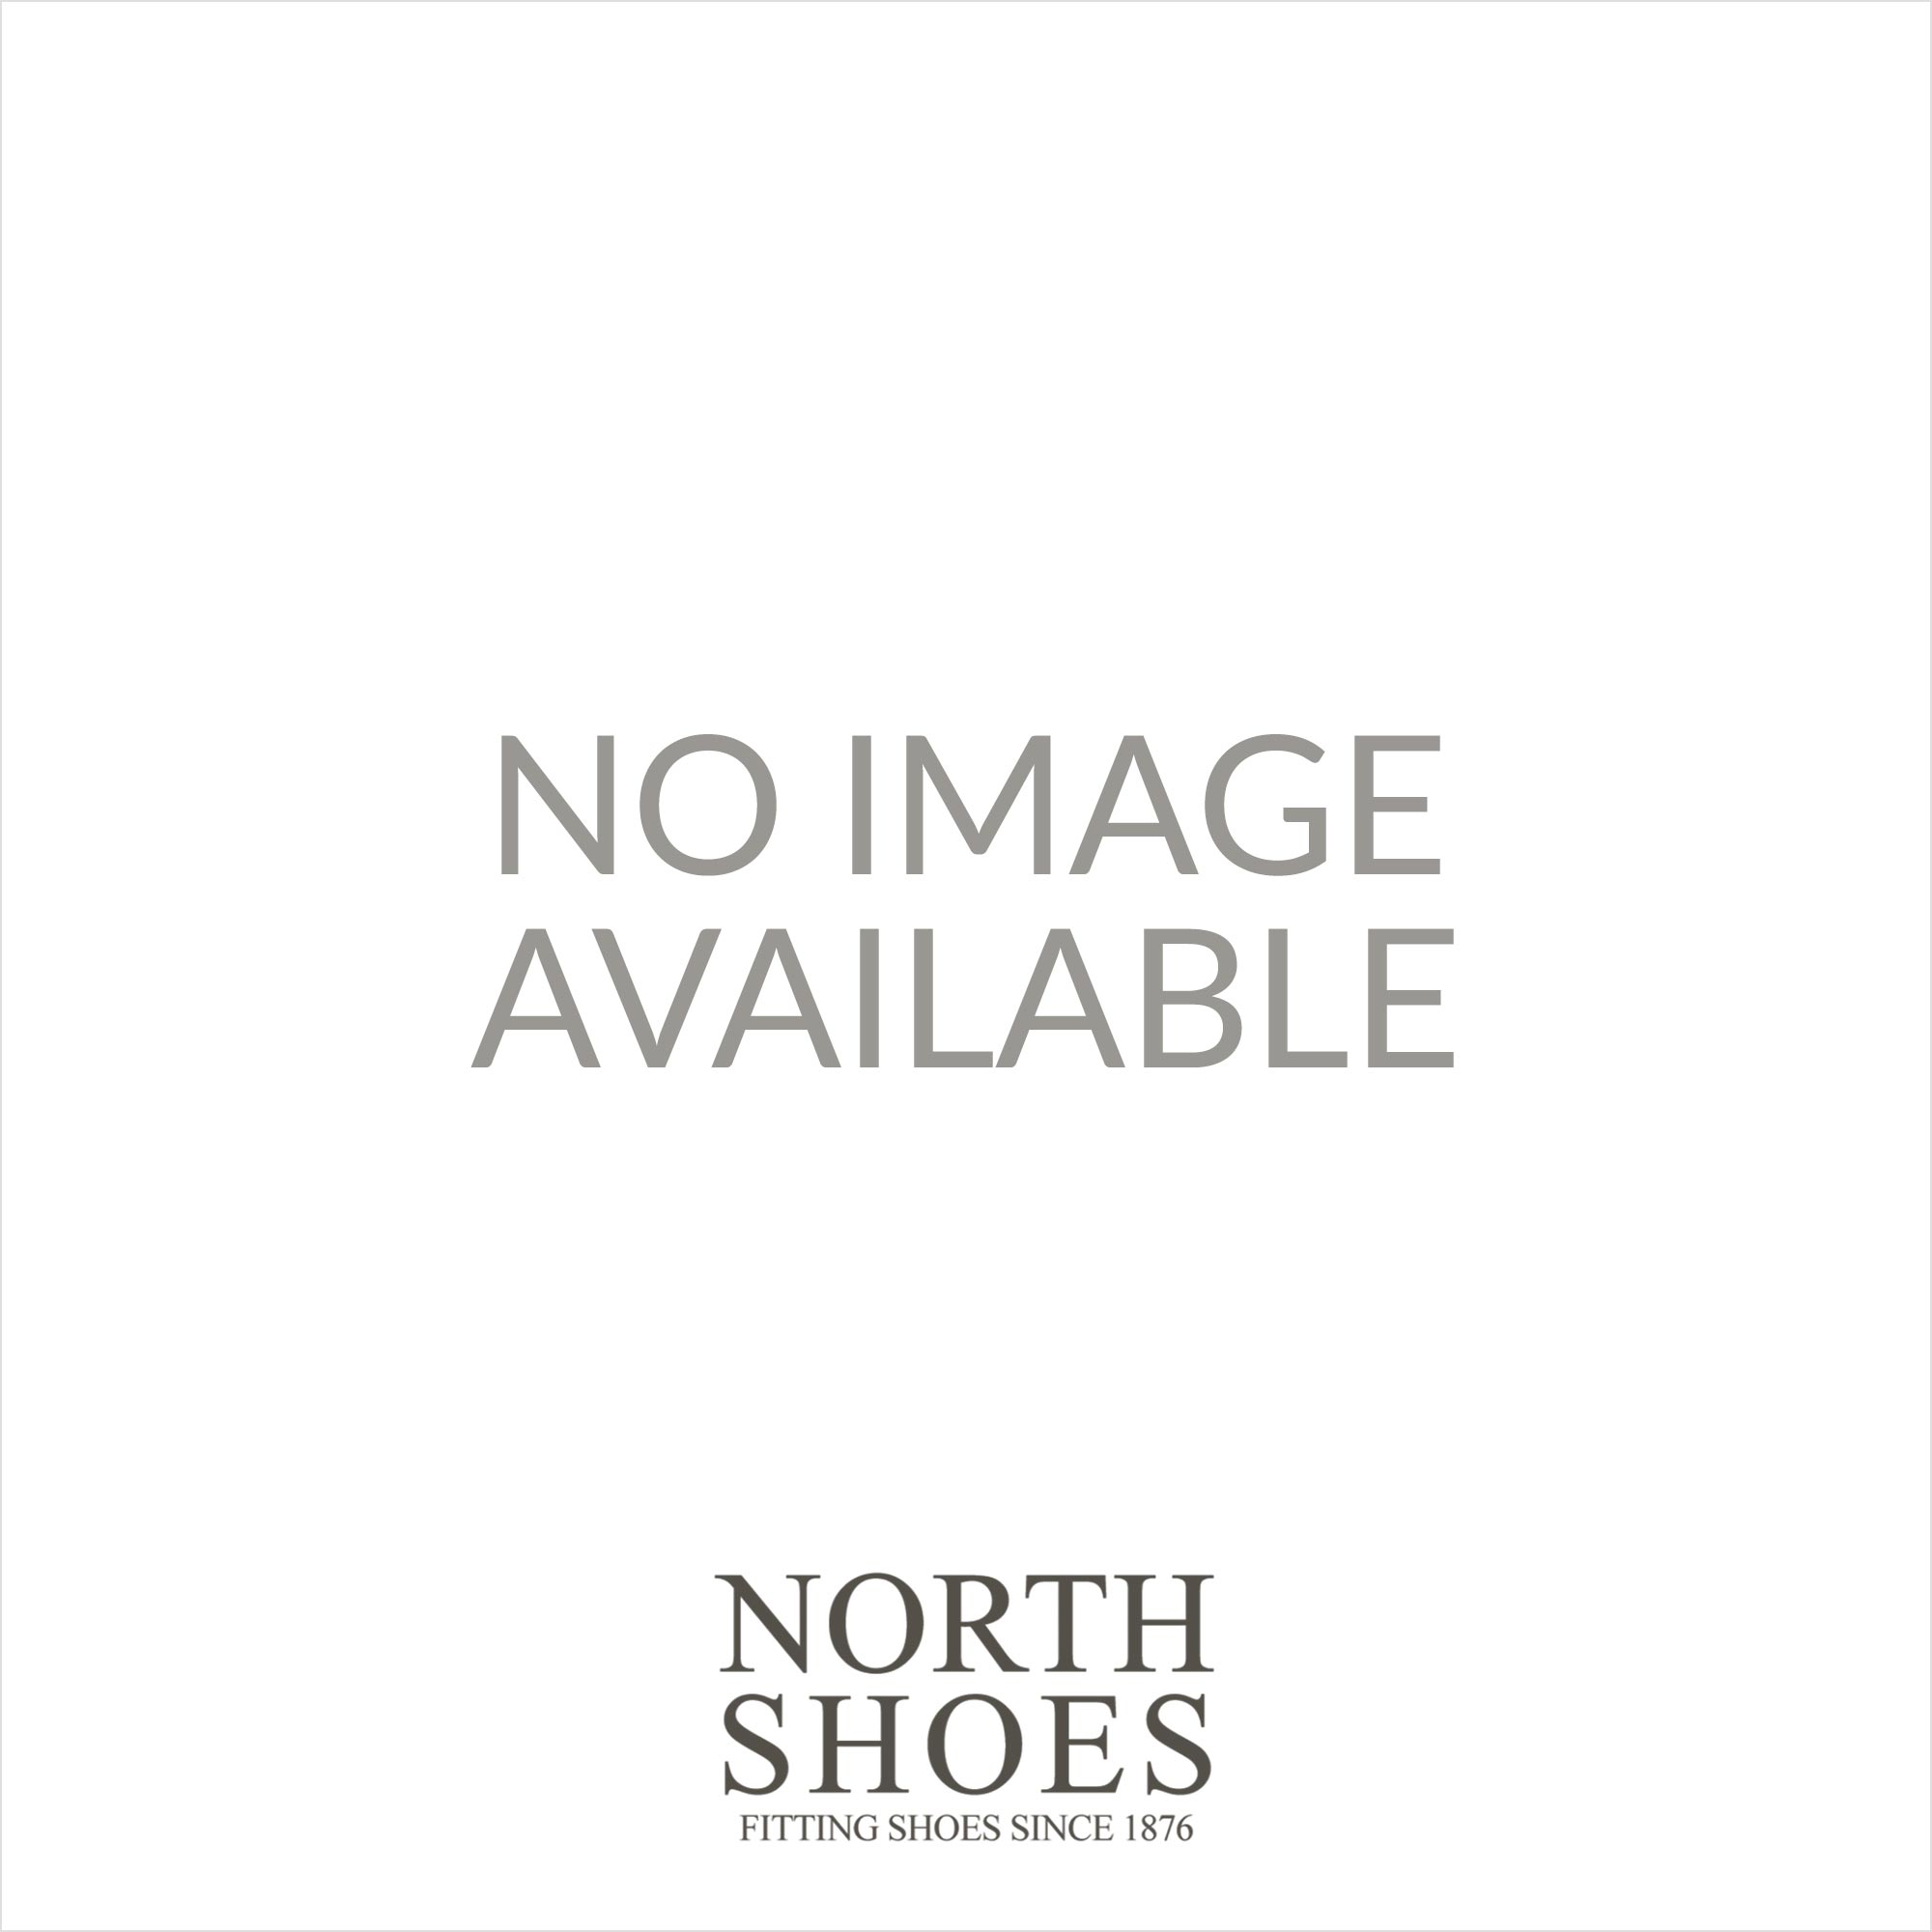 CONVERSE M9697c Navy Womens Shoe